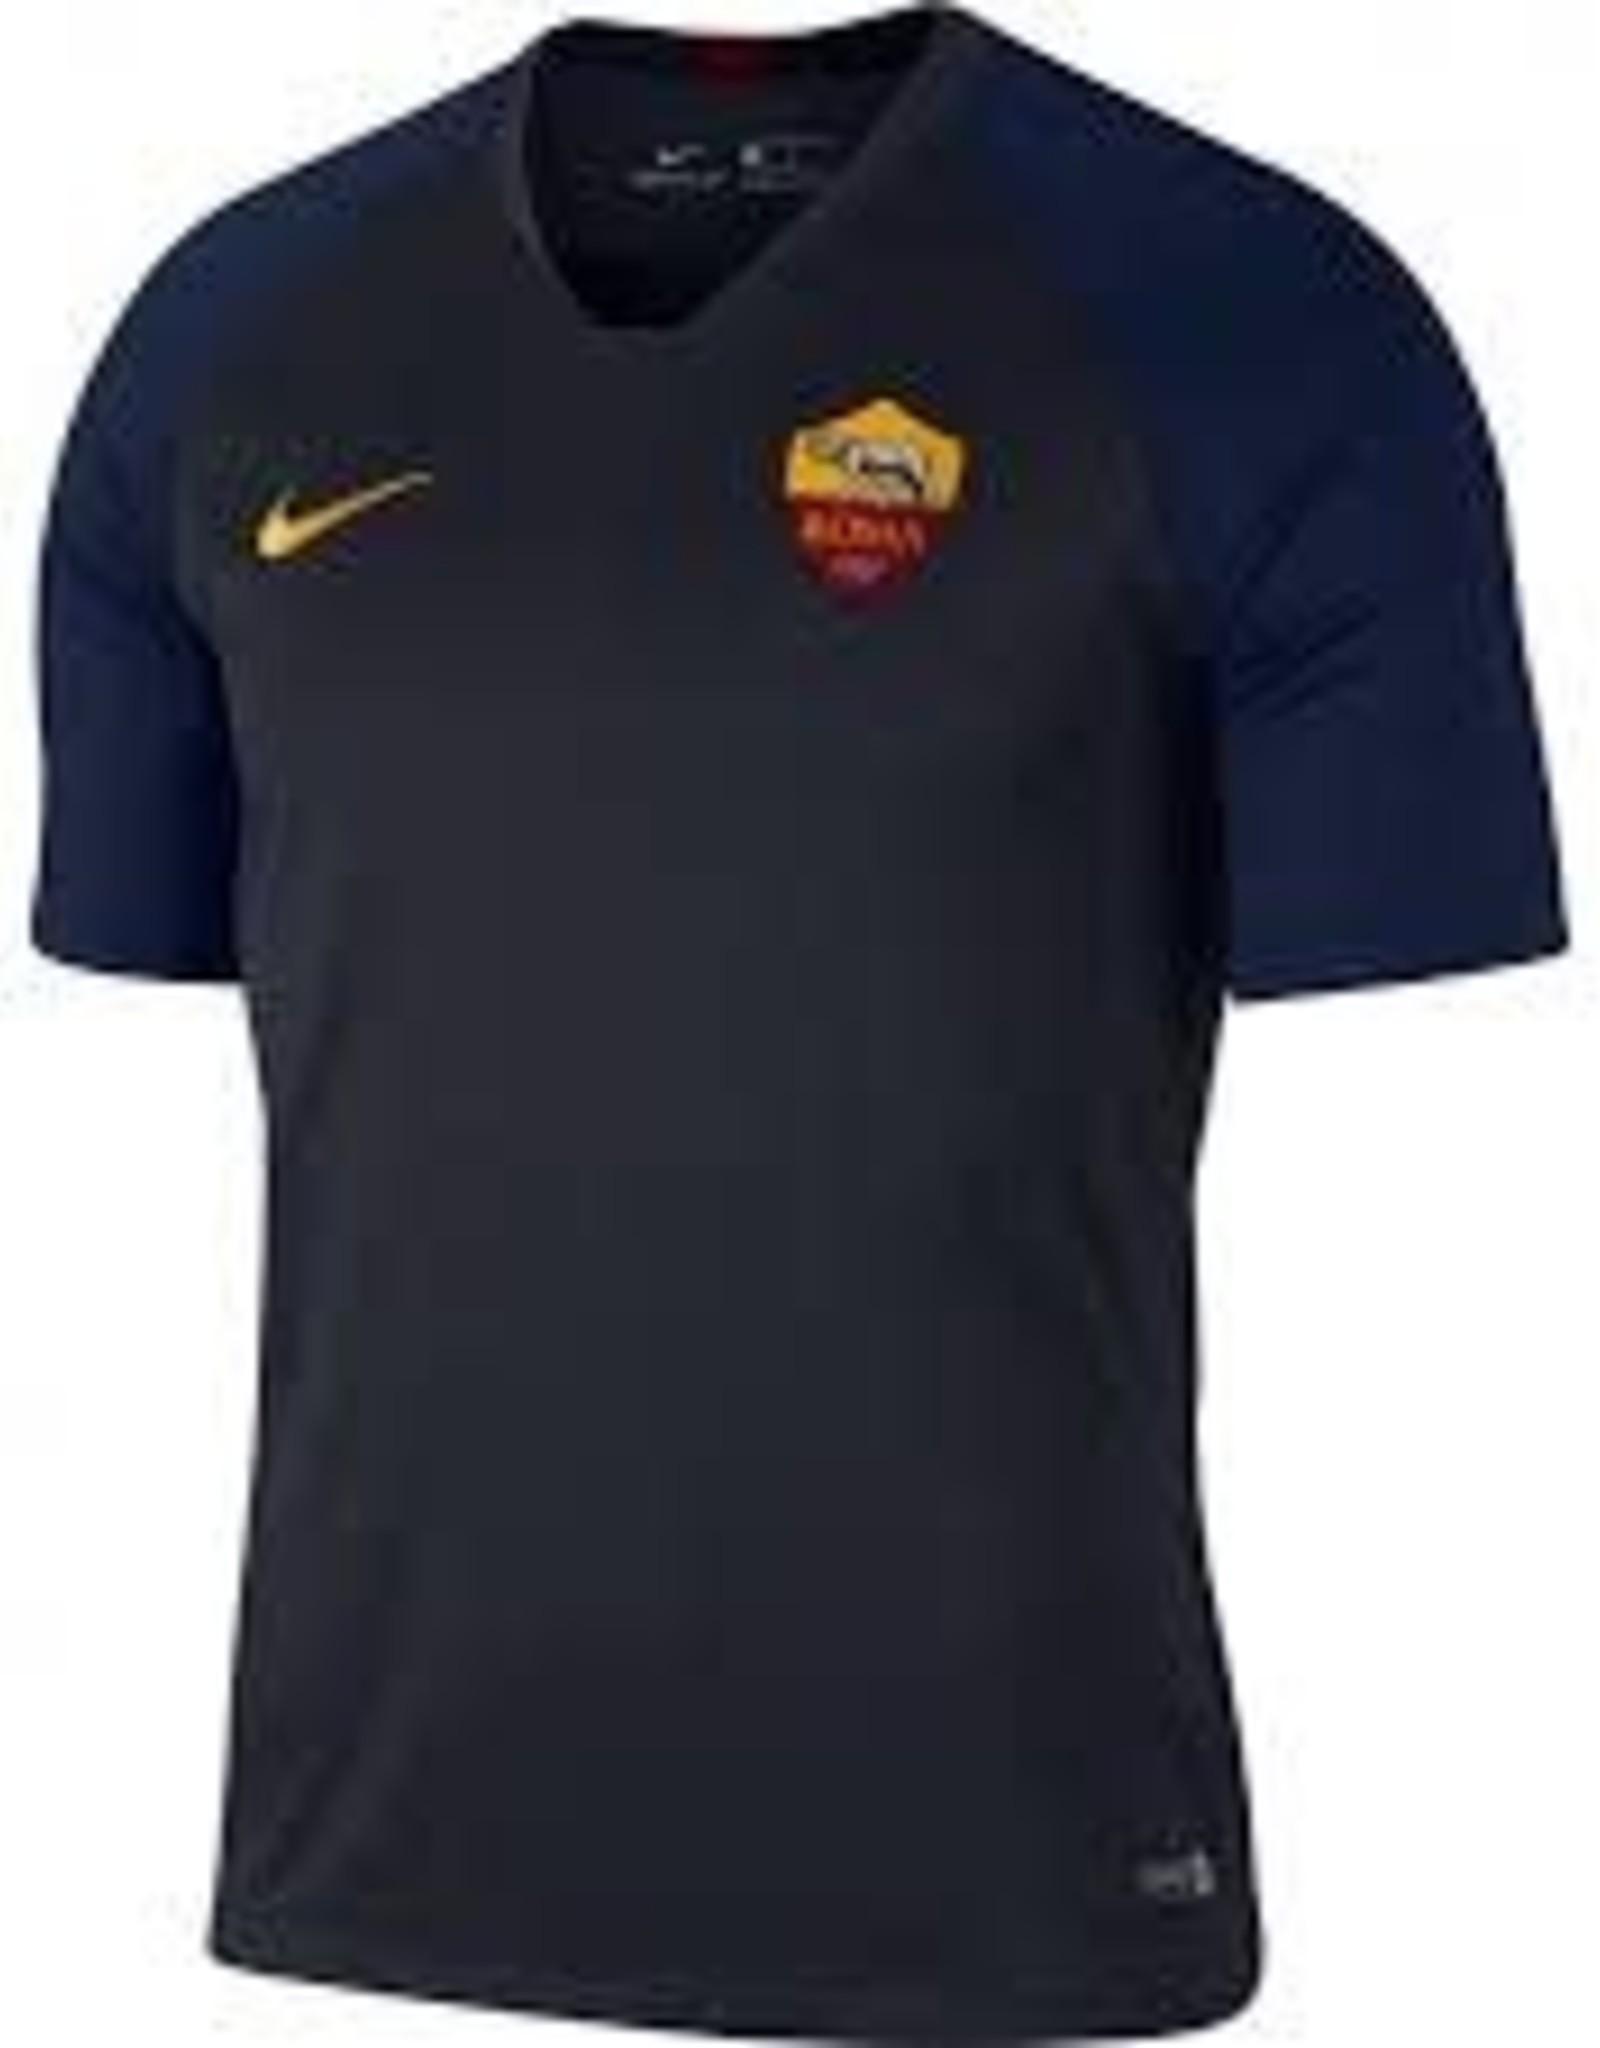 Nike Nike Roma trainings shirt